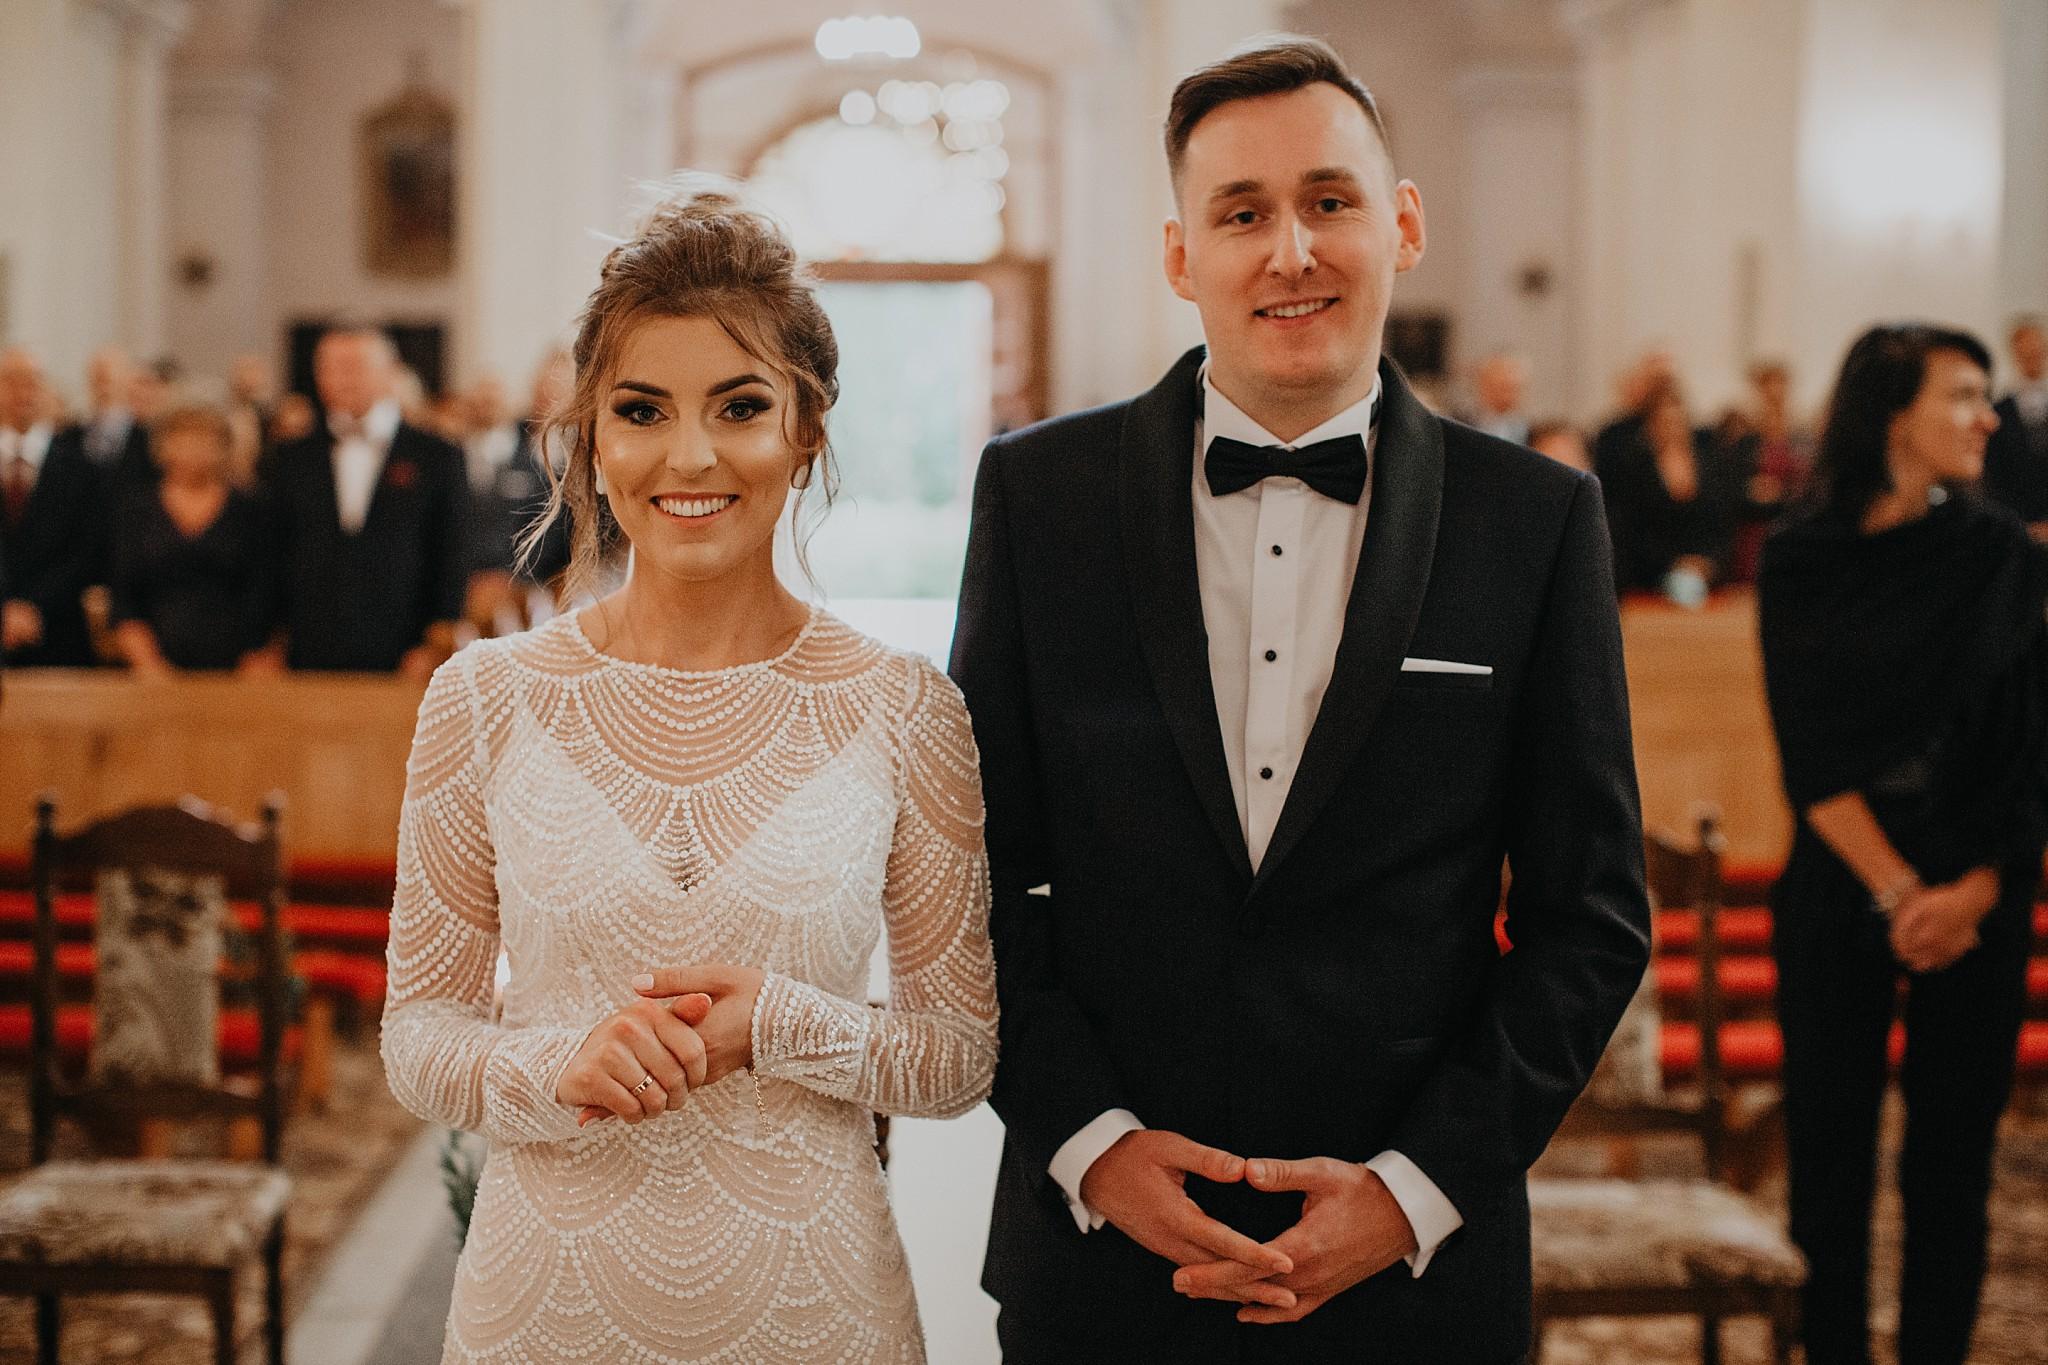 fotograf poznan wesele dobra truskawka piekne wesele pod poznaniem wesele w dobrej truskawce piekna para mloda slub marzen slub koronawirus slub listopad wesele koronawirus 181